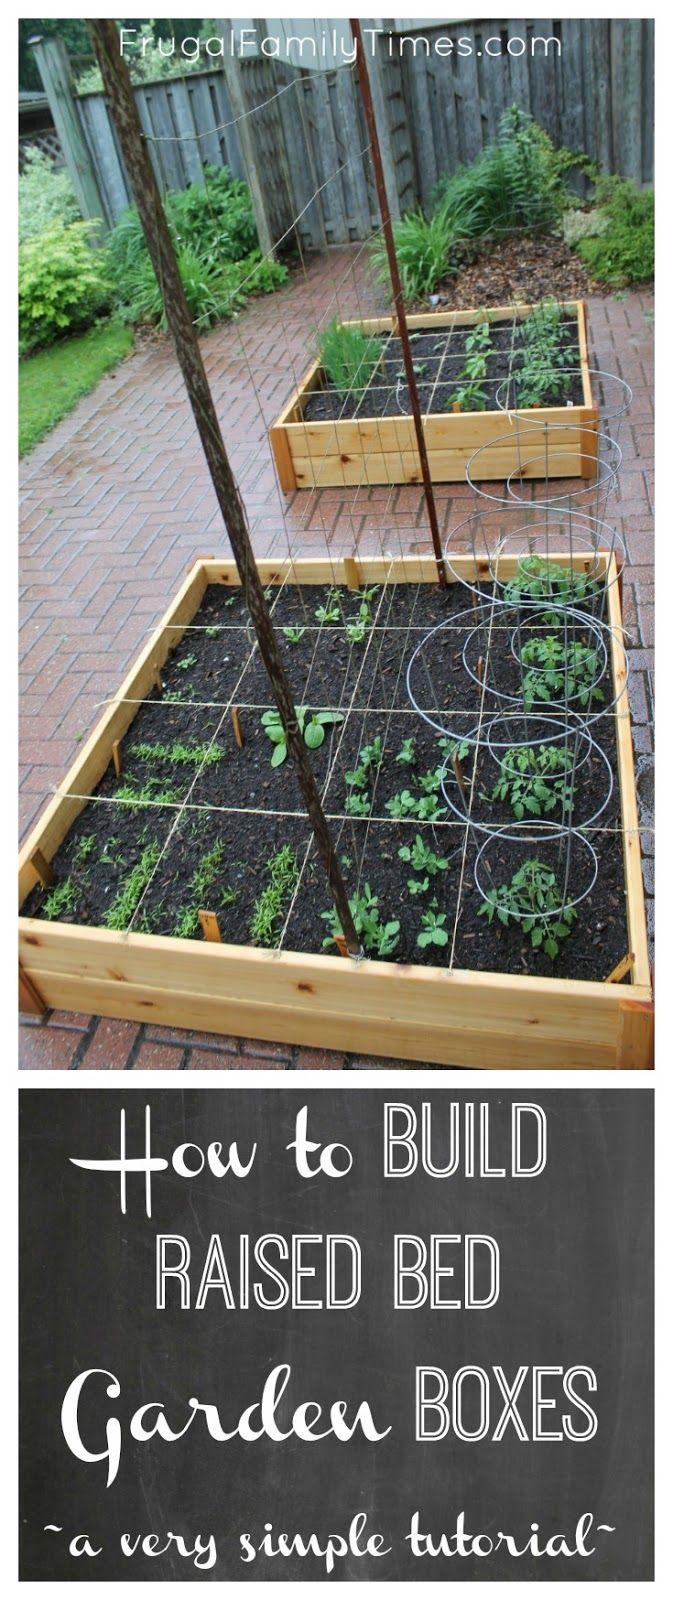 How To Build Raised Garden Boxes Diy Grow Vegetables Anywhere Garden Boxes Raised Building Raised Garden Beds Garden Boxes Diy